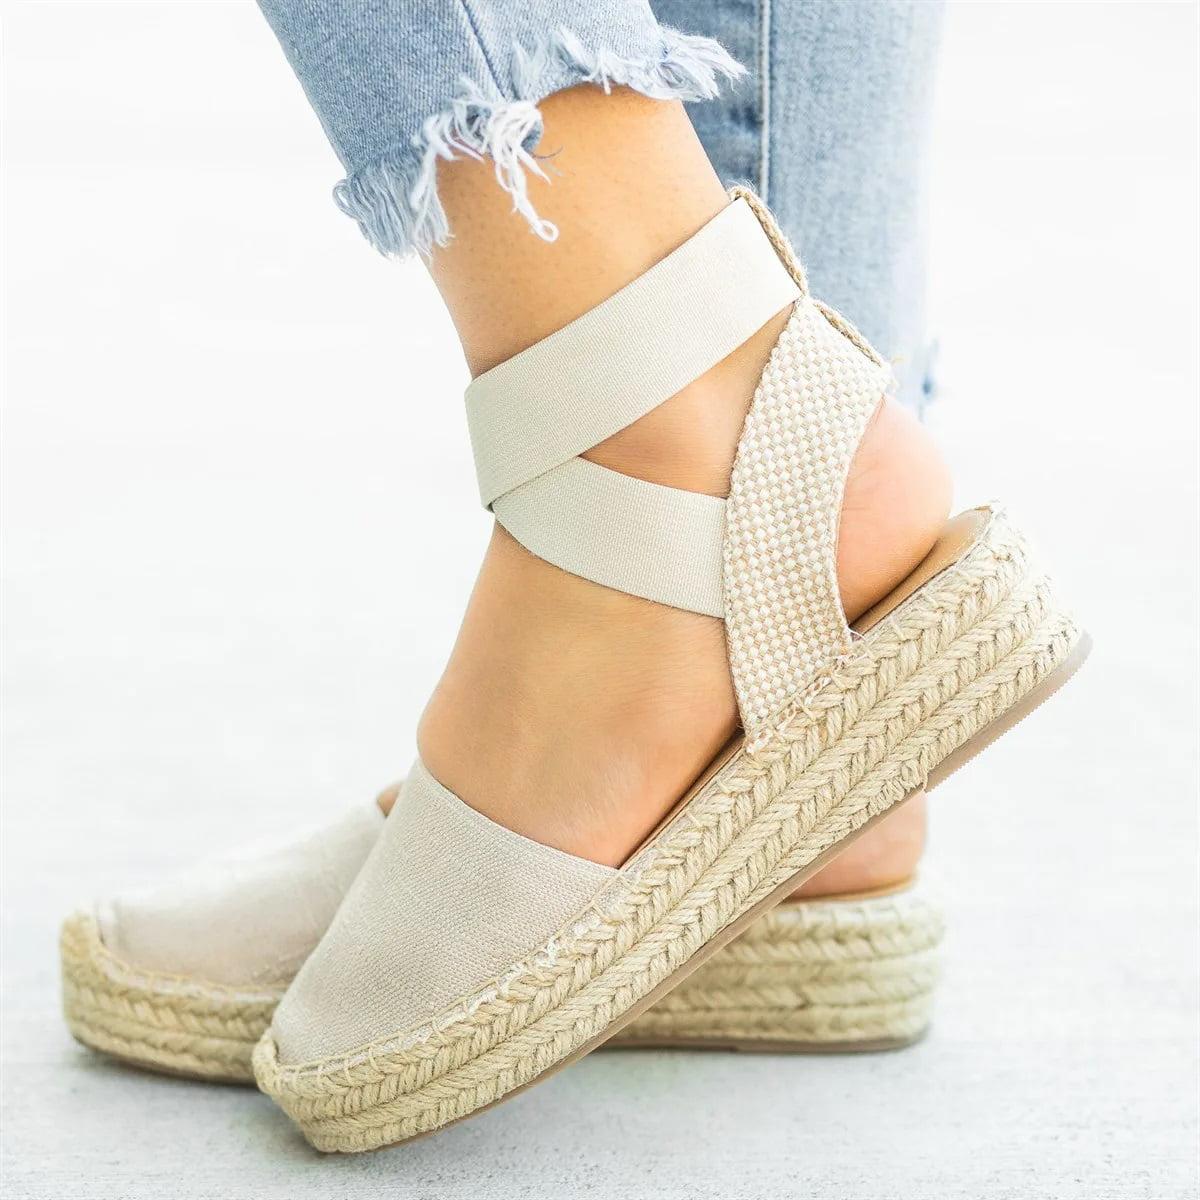 Womens Vava-1 Low Heel Sandal Nude